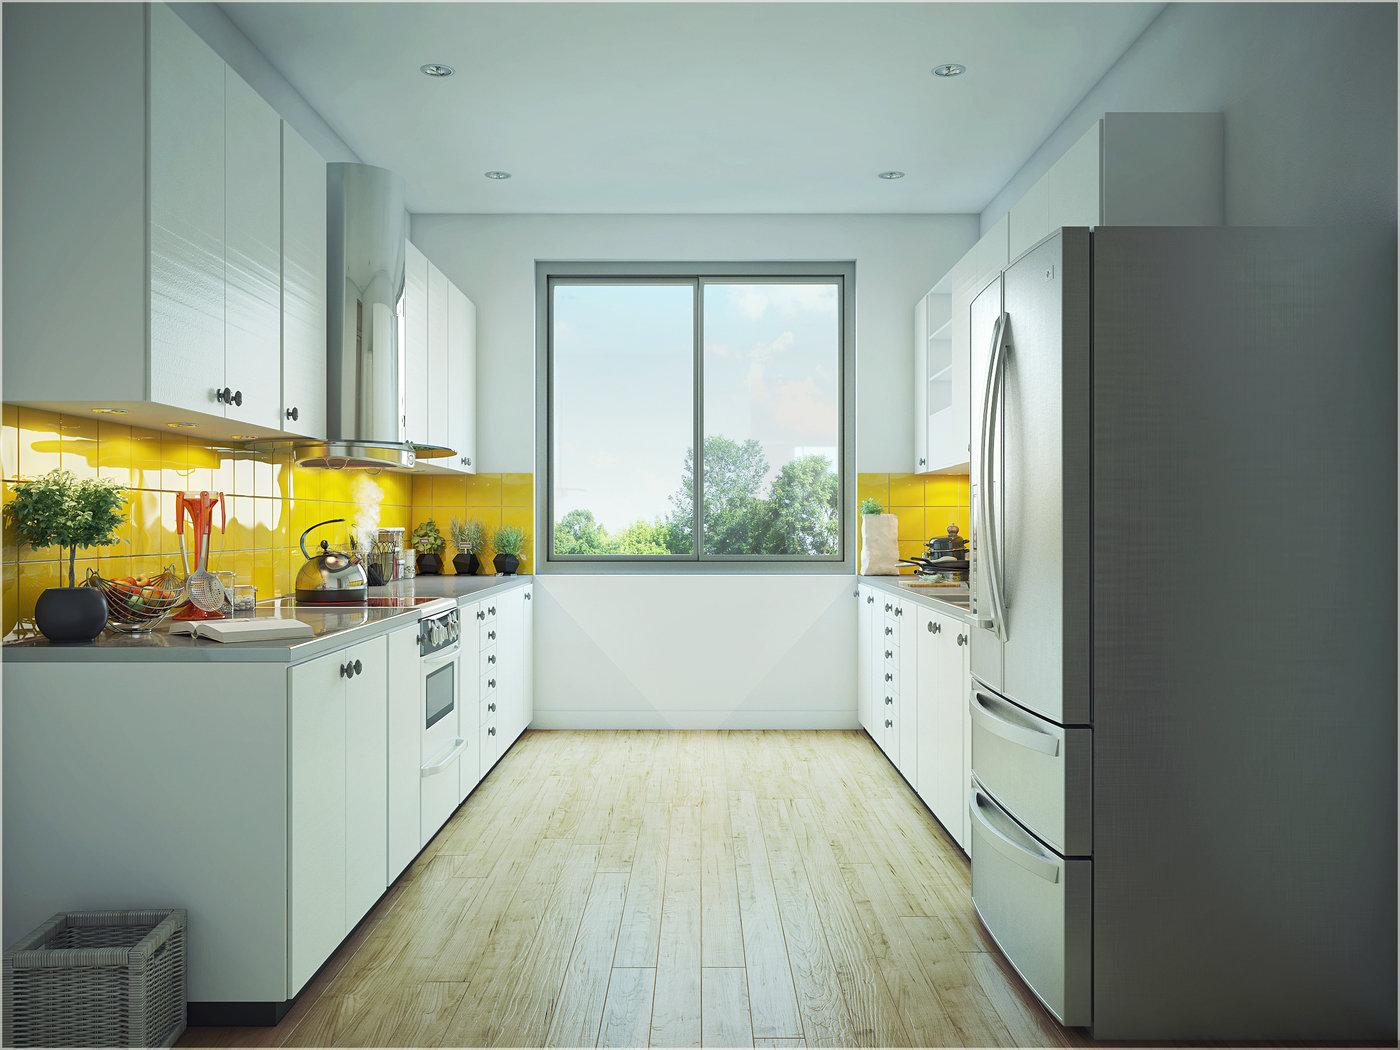 Kitchen Photography In 3Ds Max by Krishan Kumar Lawasha at Coroflot.com